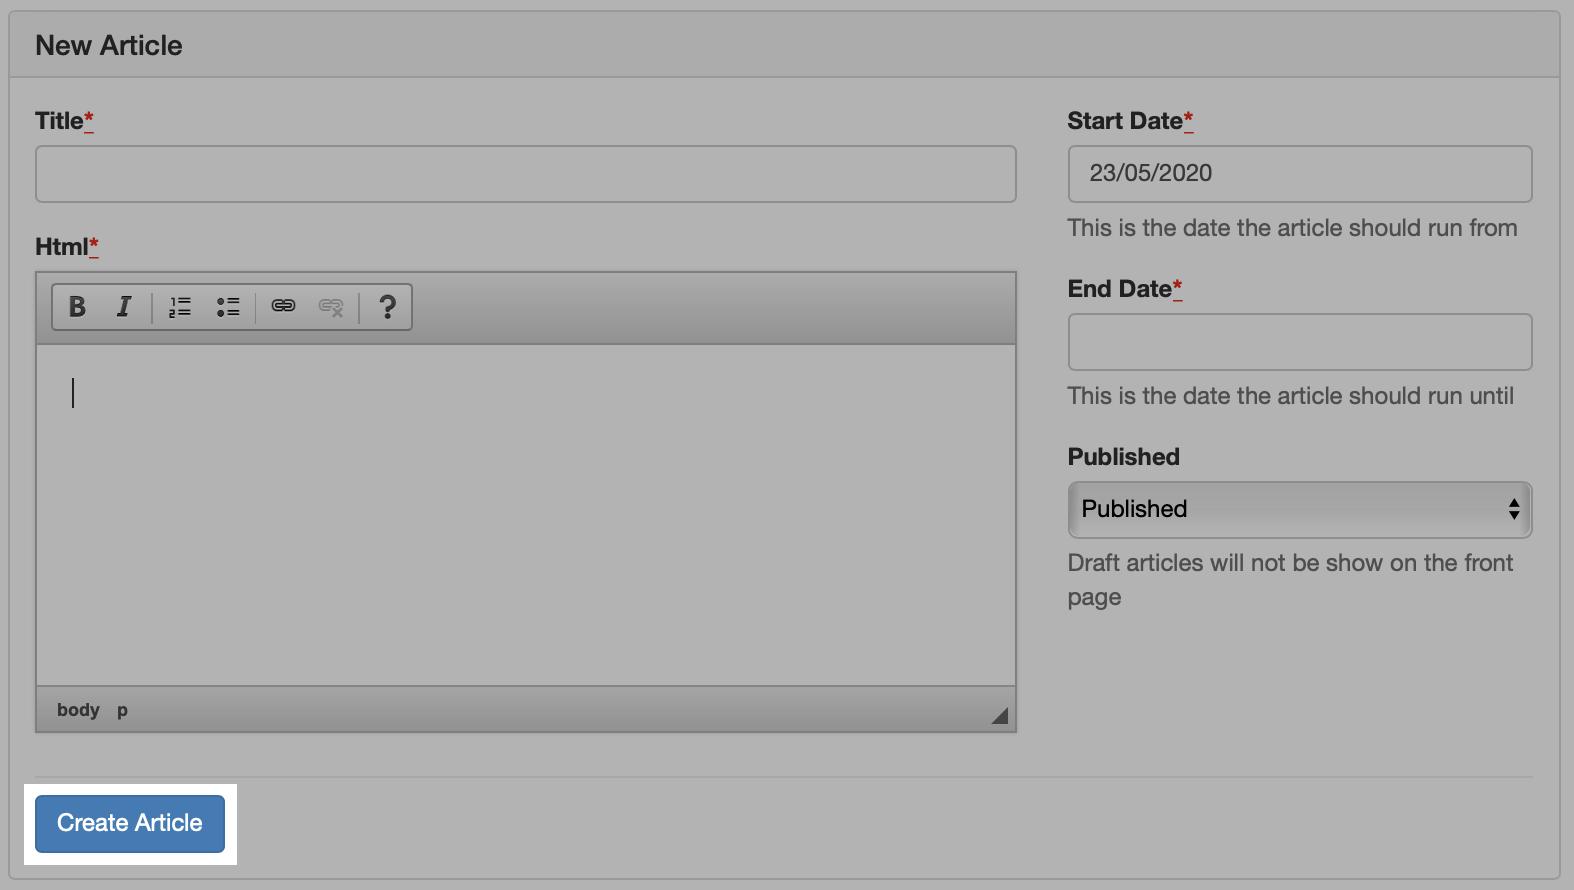 Screenshot_2020-05-23_at_14.24.00_copy.png